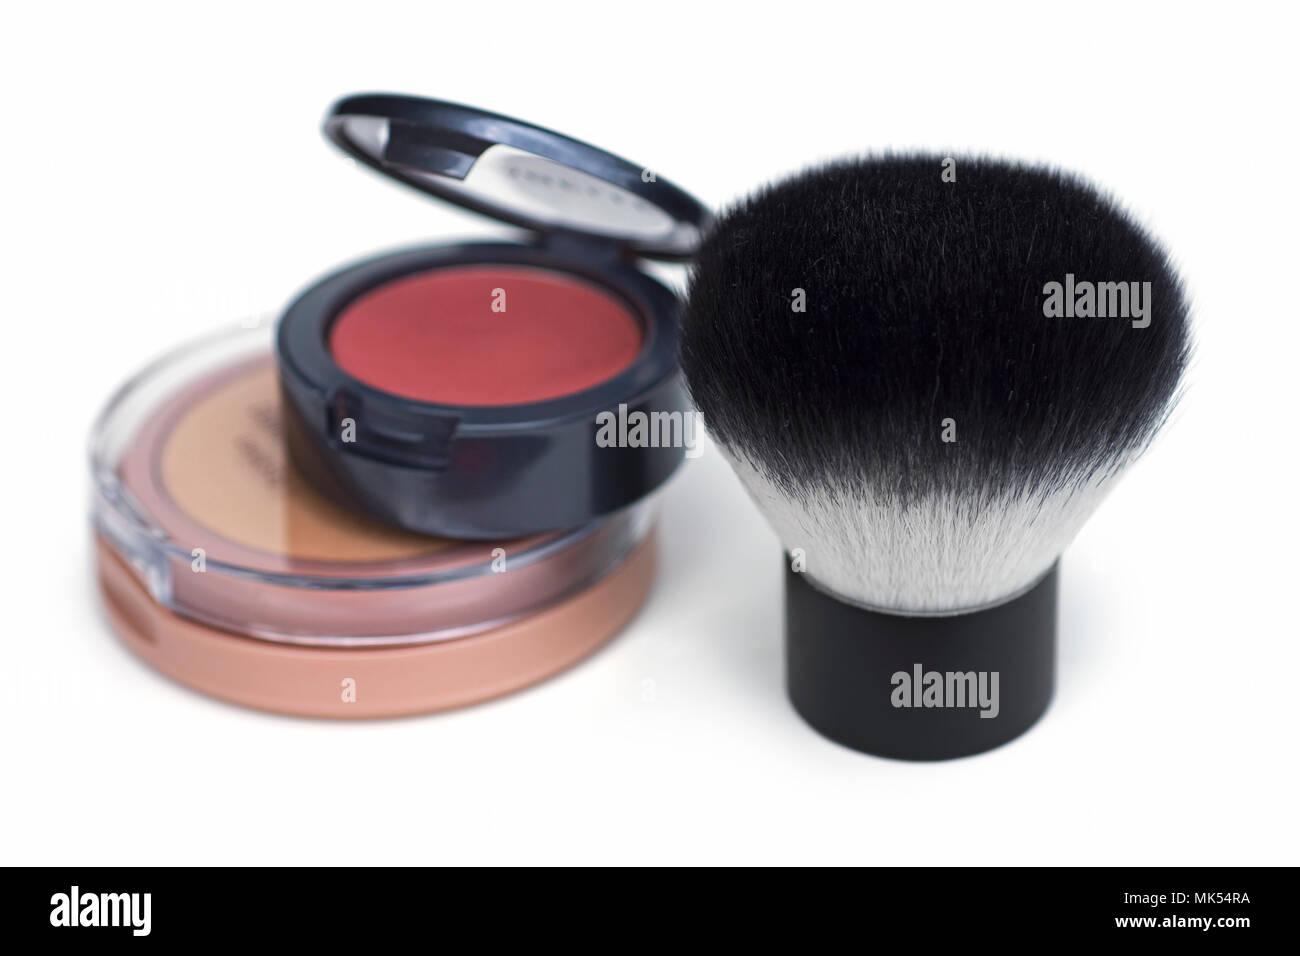 Kabuki Brush, Cosmetics, Powder, Makeup Cosmetic Compact - Stock Image